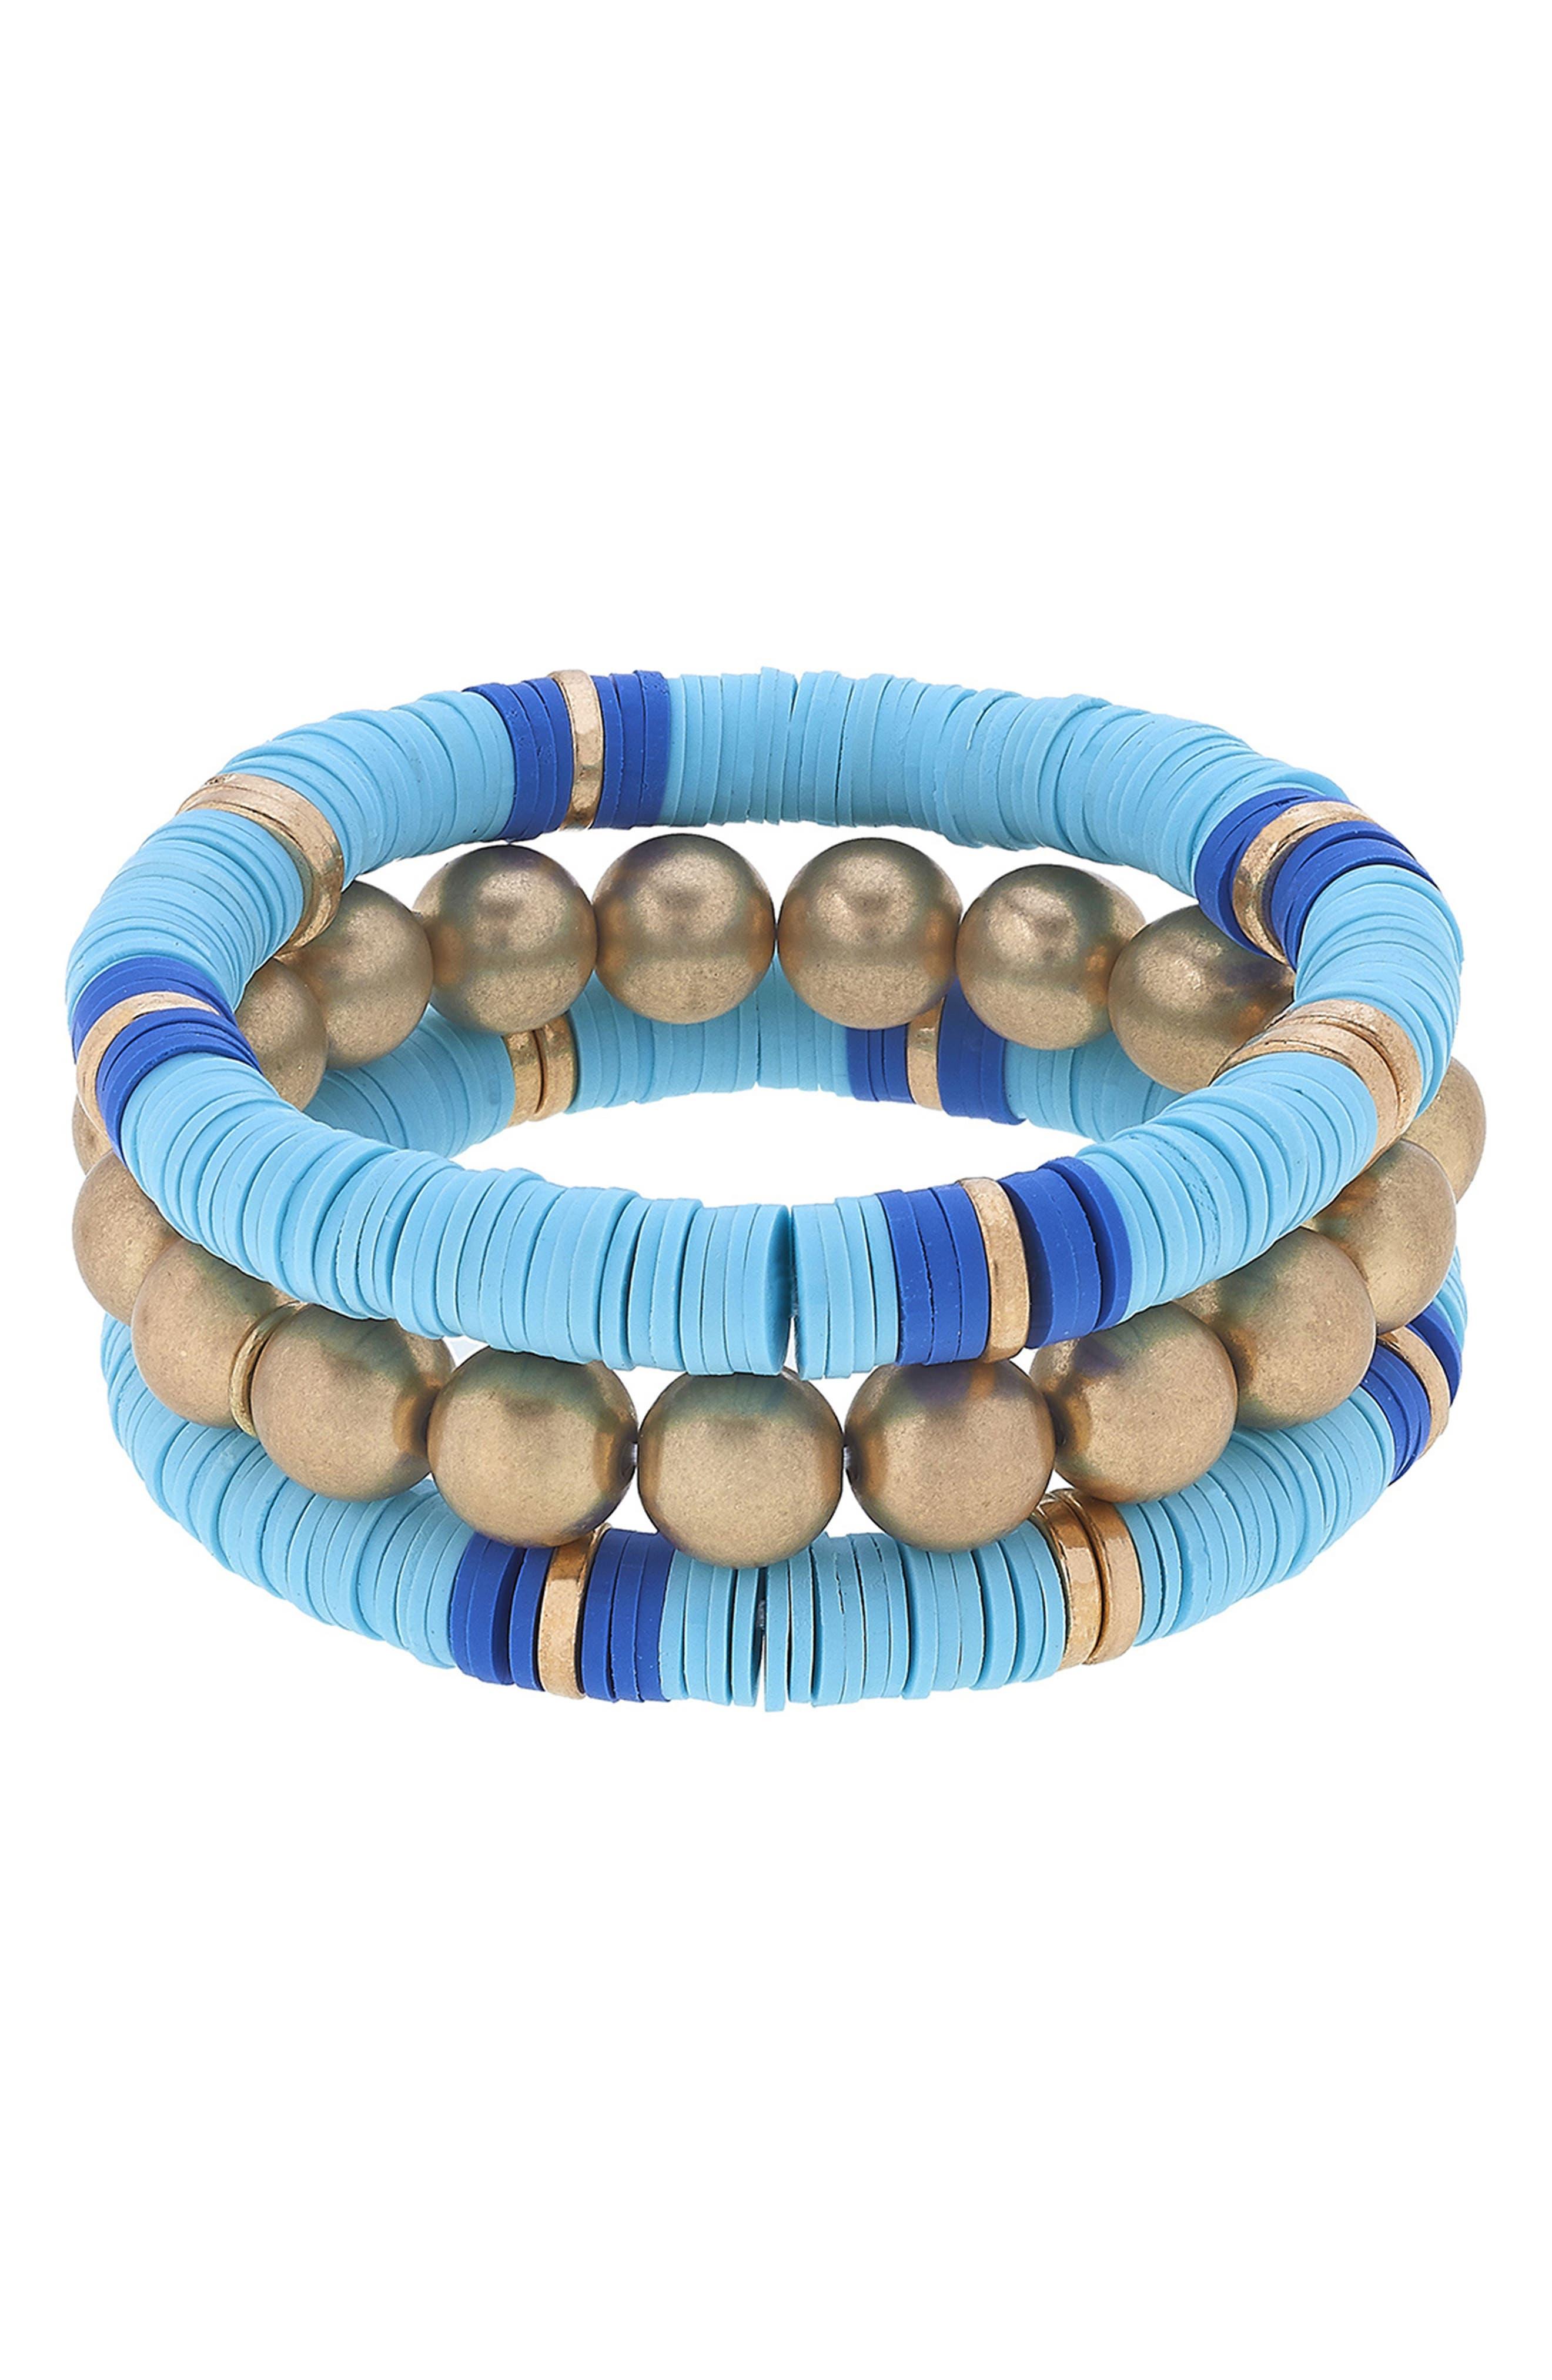 Emberly Set Of 3 Beaded Stacking Bracelets